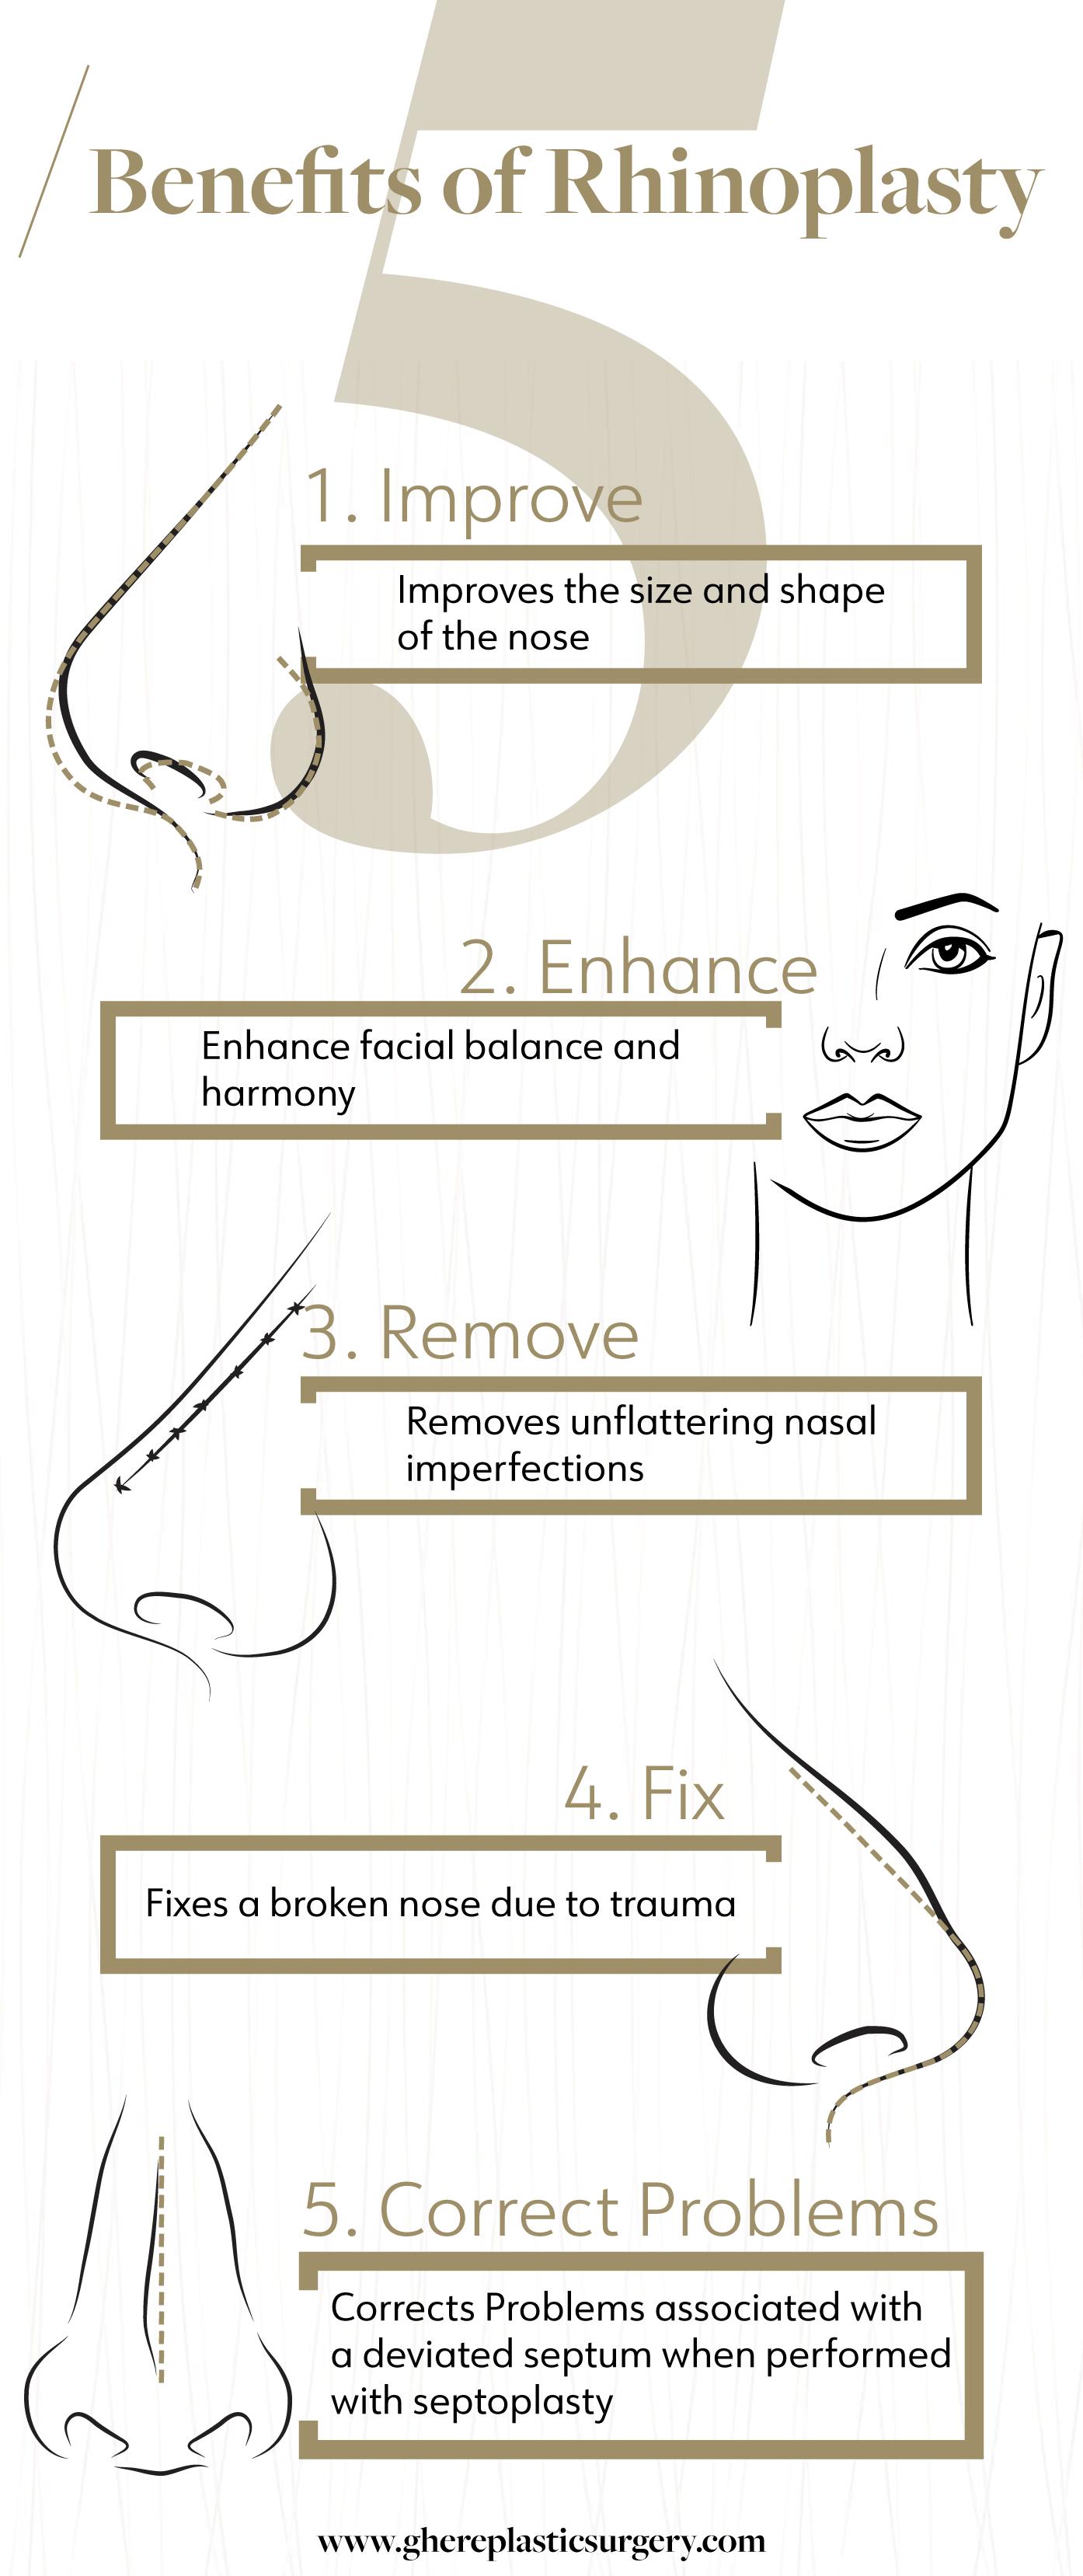 Rhinoplasty Infographic